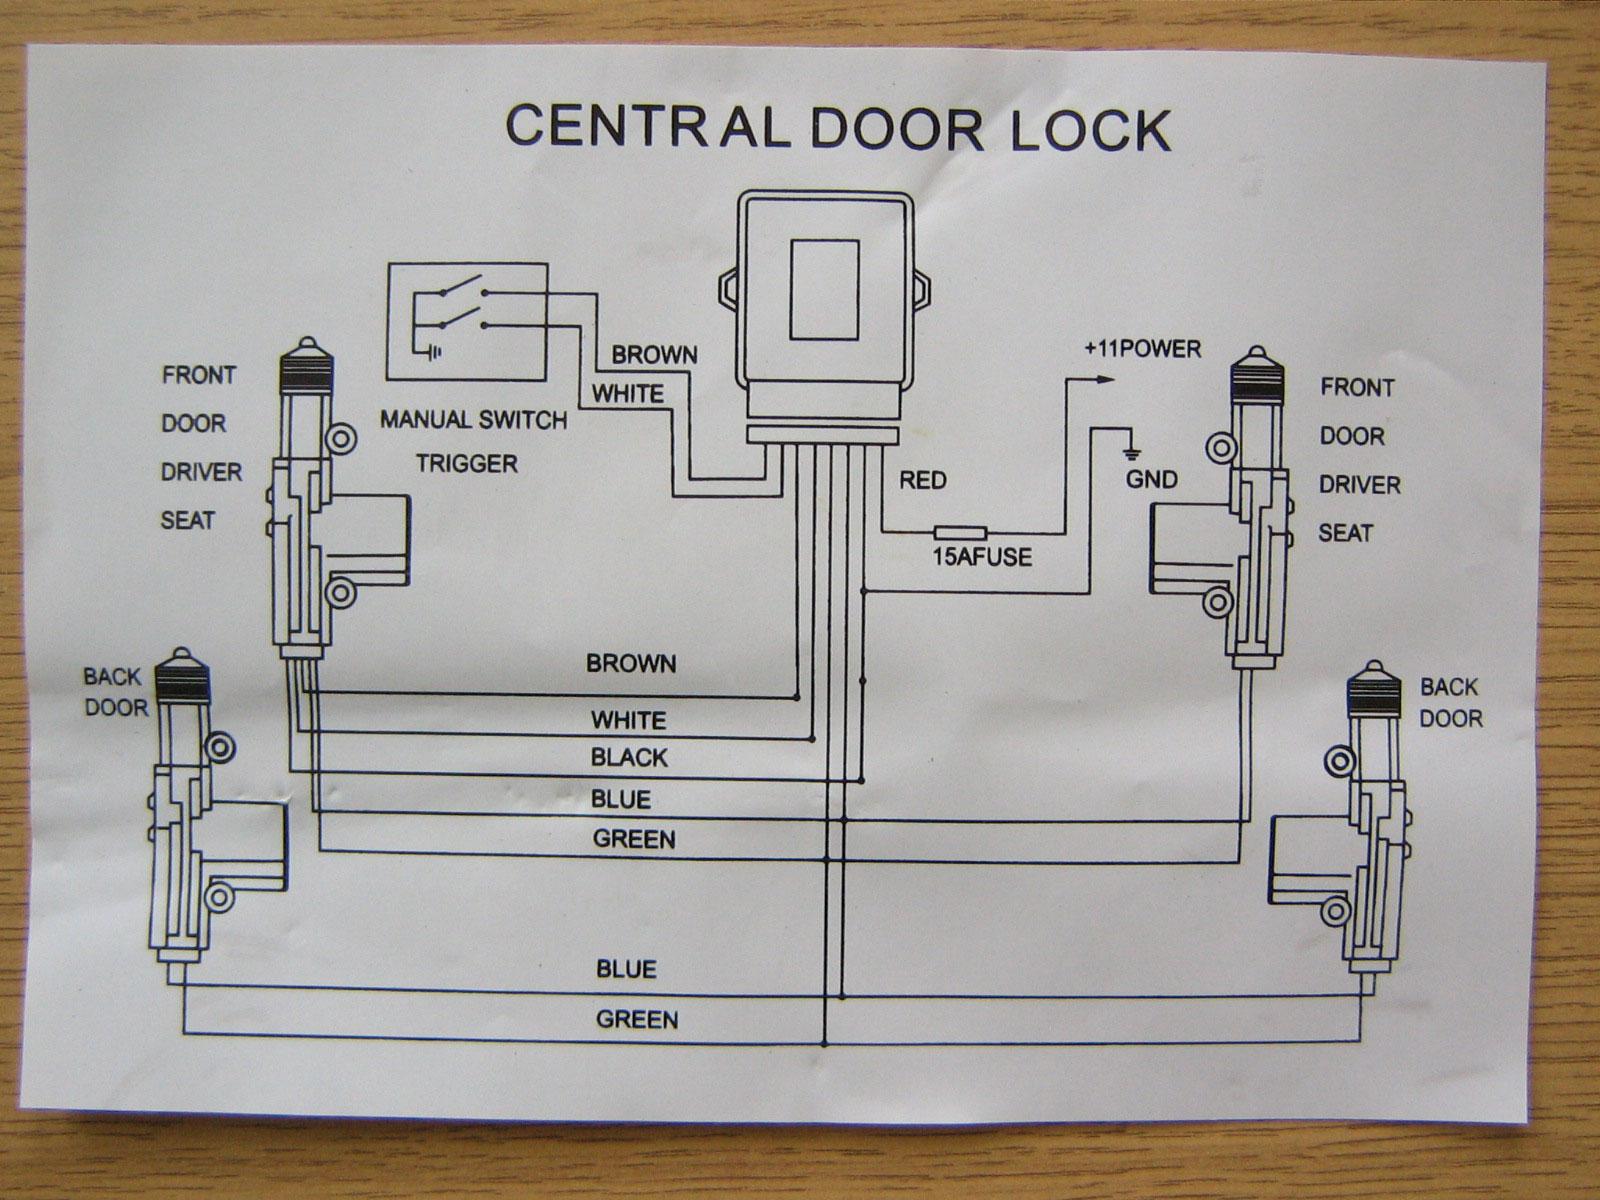 Acutator Interlock Wiring Diagram To Fan - 2007 Pontiac G6 Engine Fuse Box  Diagram - fusebox.tukune.jeanjaures37.fr | Acutator Interlock Wiring Diagram To Fan |  | Wiring Diagram Resource